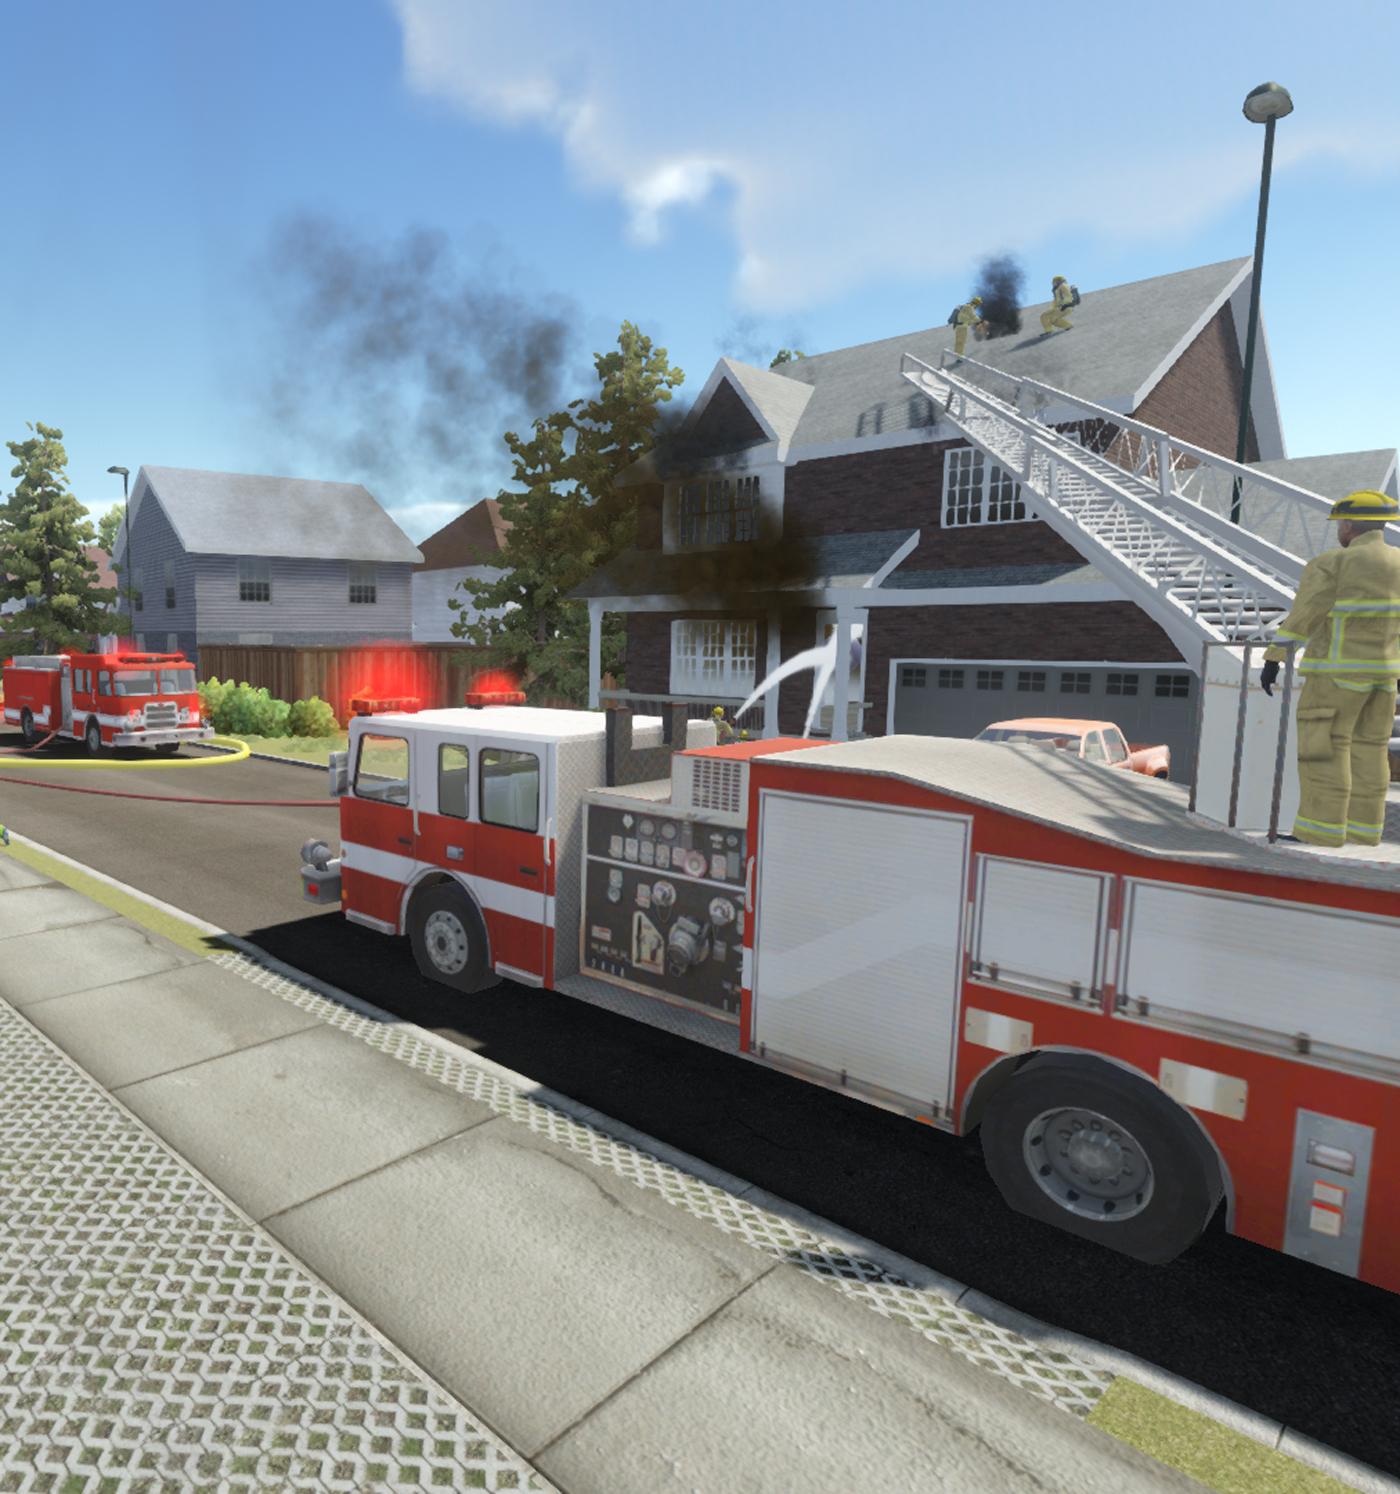 XVR OS 20 MULTI FIRE POLICE FIRE Crescent Neighborhoud13 25 Crescent neighborhood